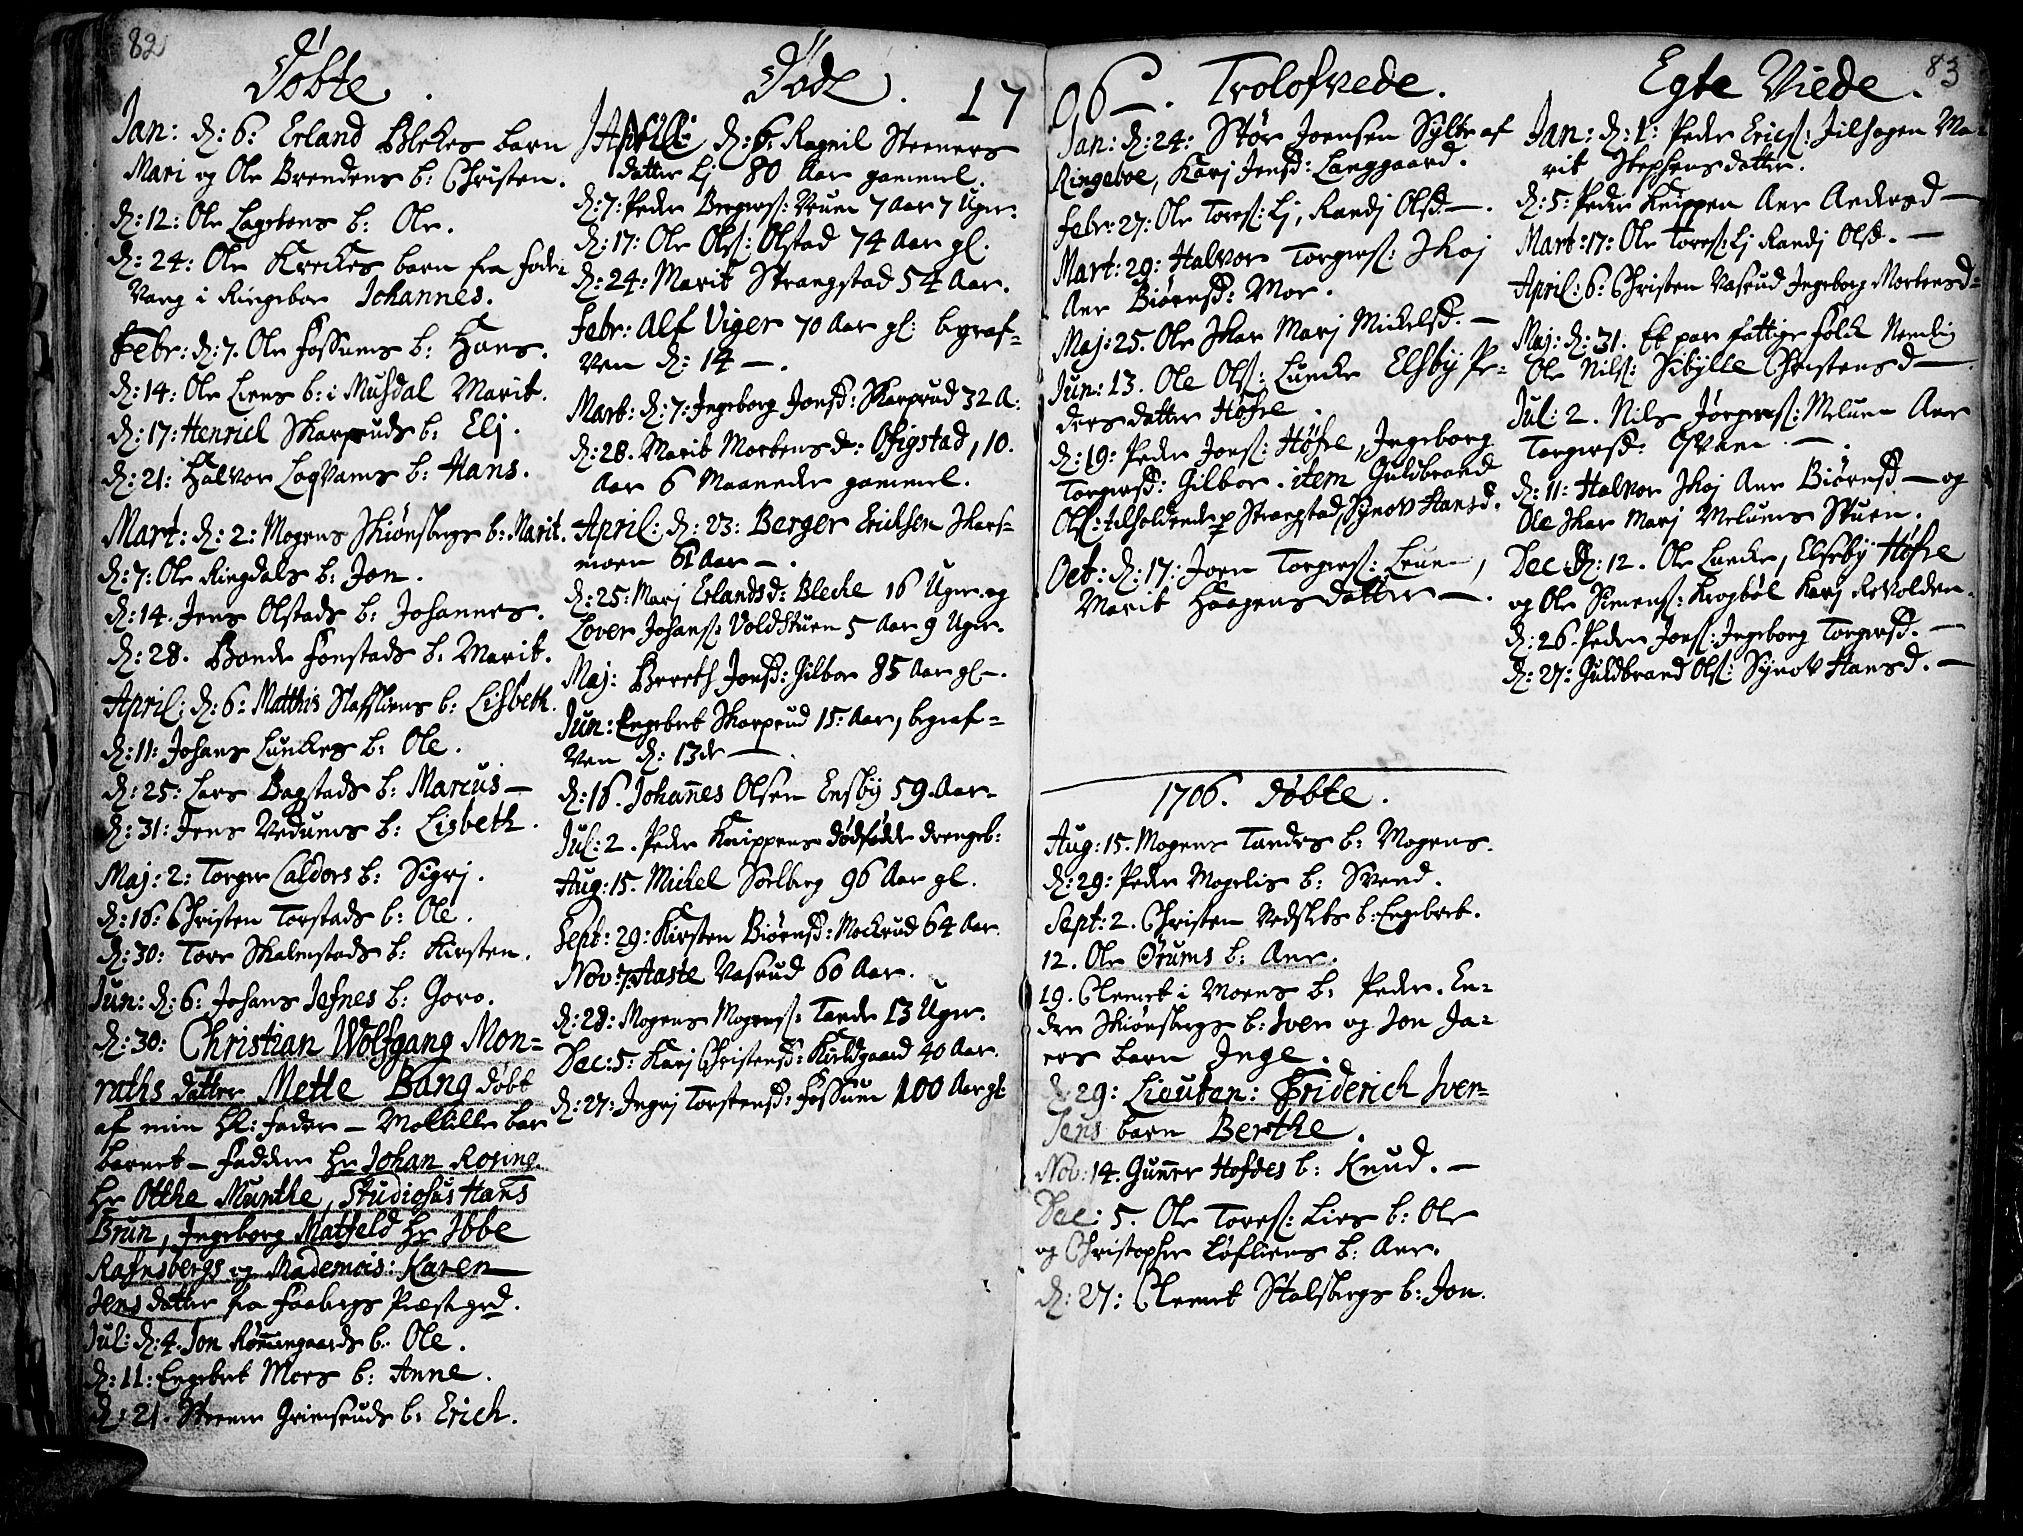 SAH, Øyer prestekontor, Ministerialbok nr. 1, 1671-1727, s. 82-83